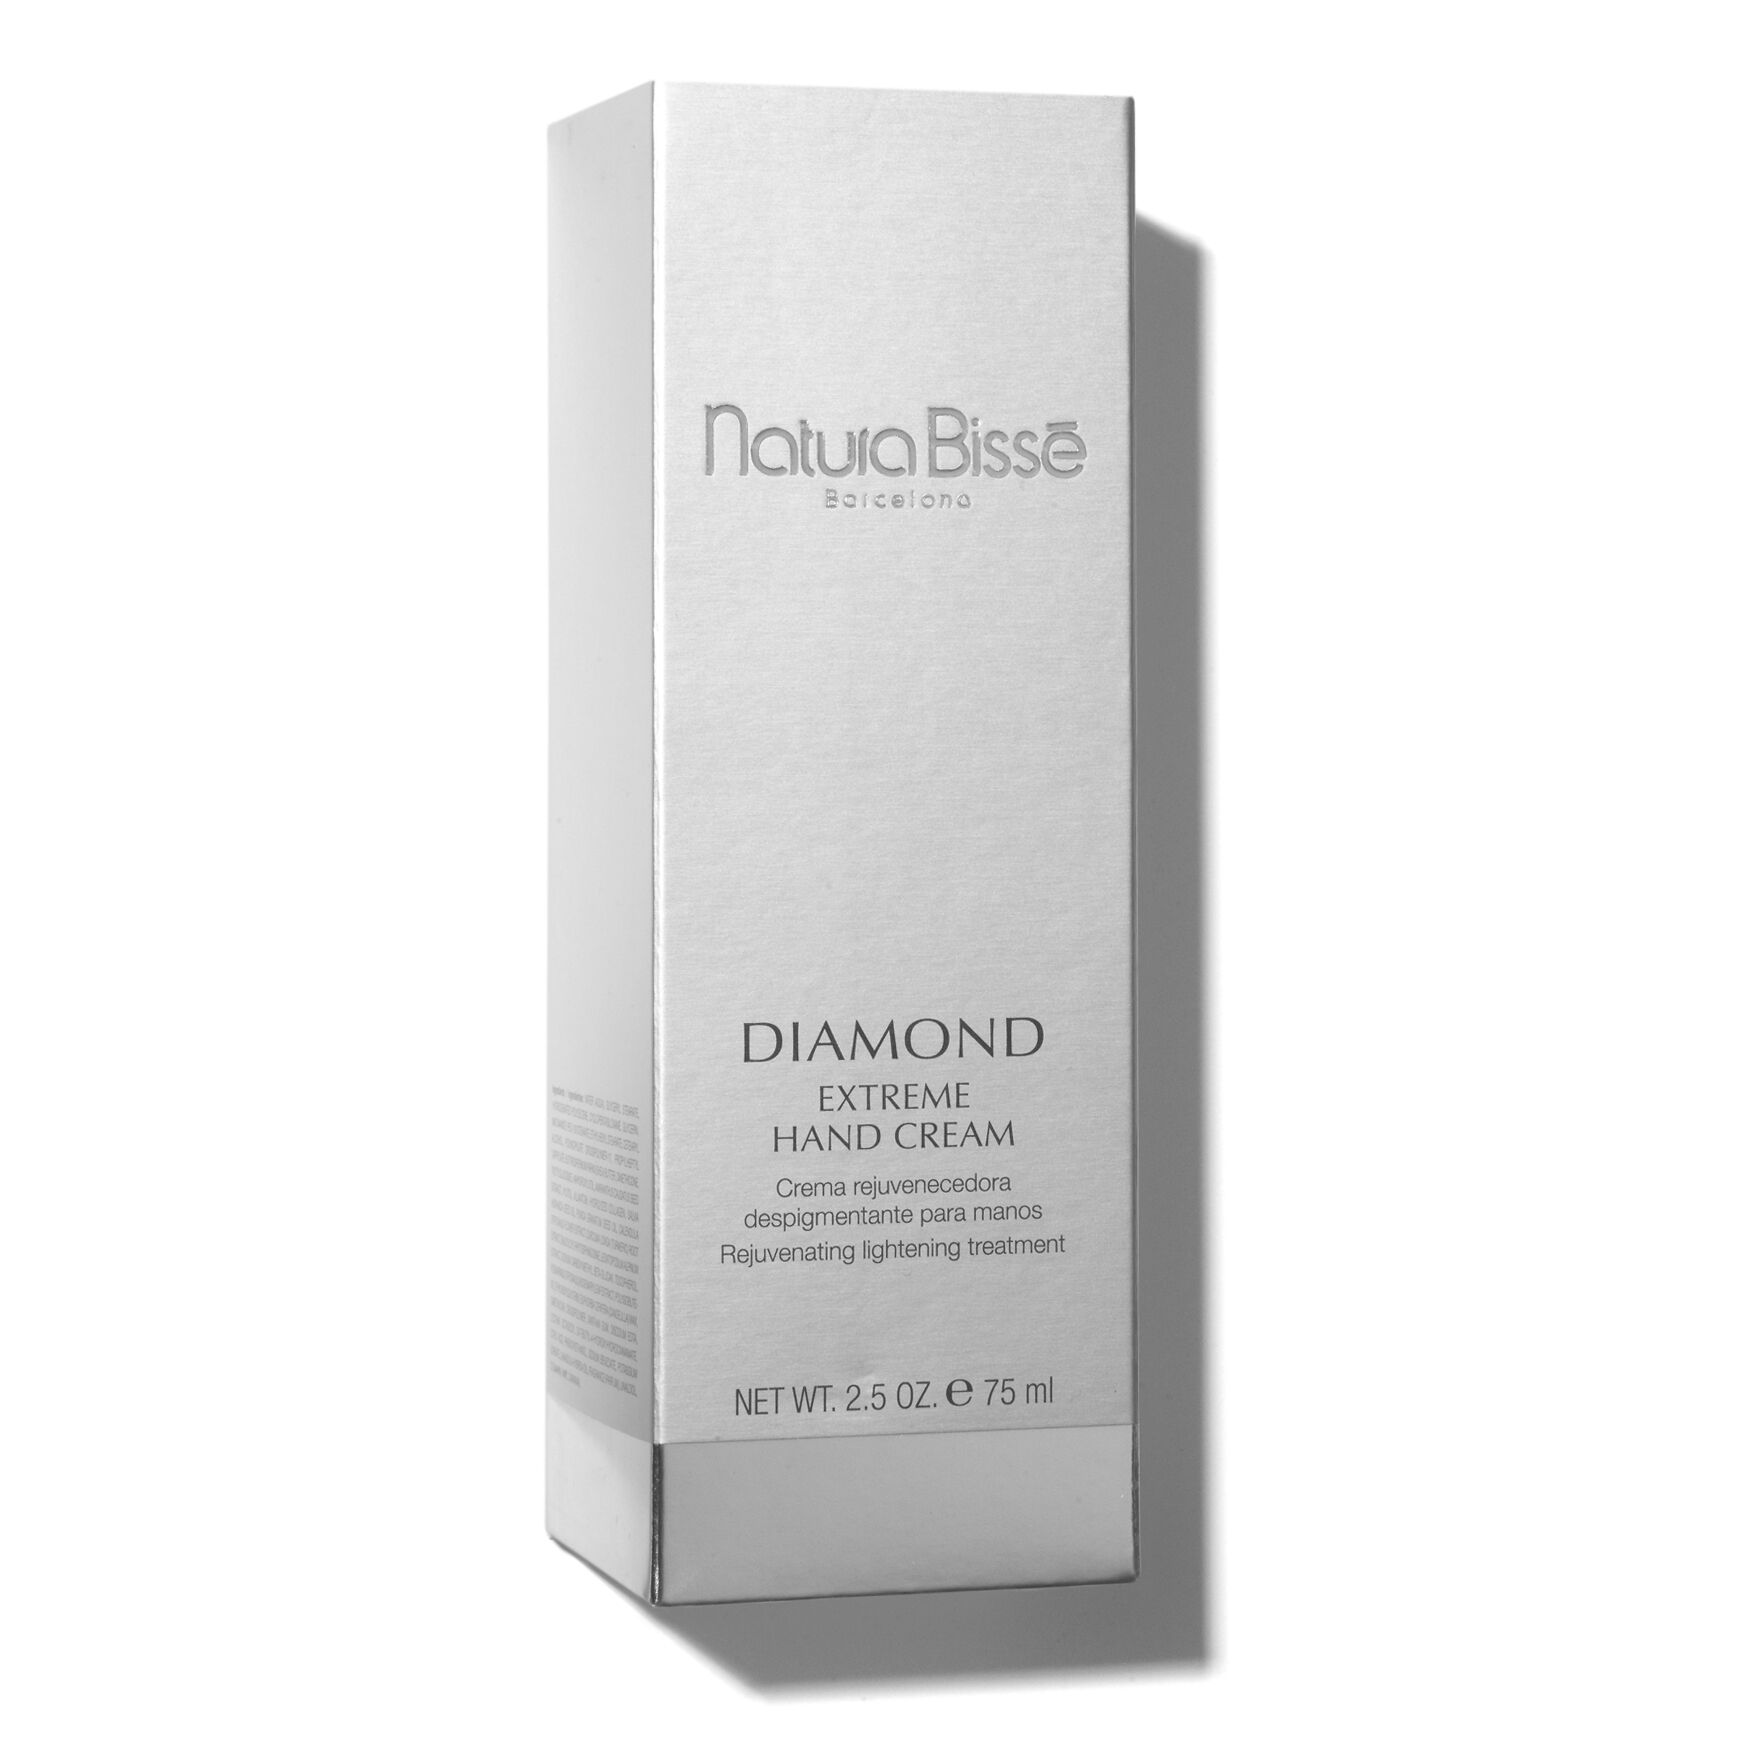 Natura Bissé Diamond Extreme Hand Cream